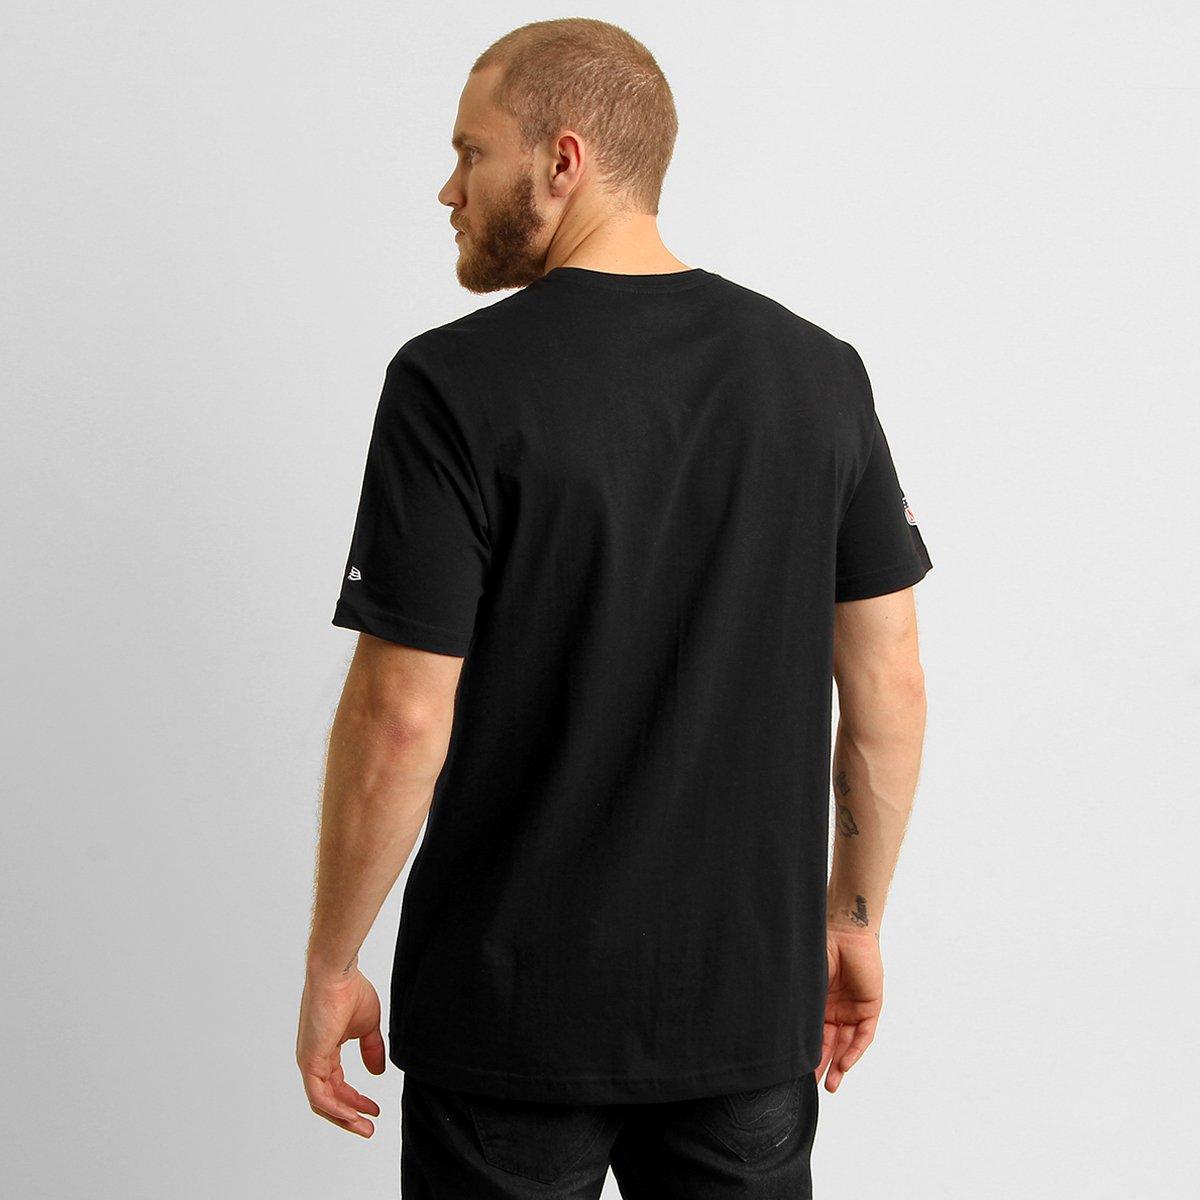 a670a4c1d3 Camiseta New Era NFL Atlanta Falcons - Compre Agora